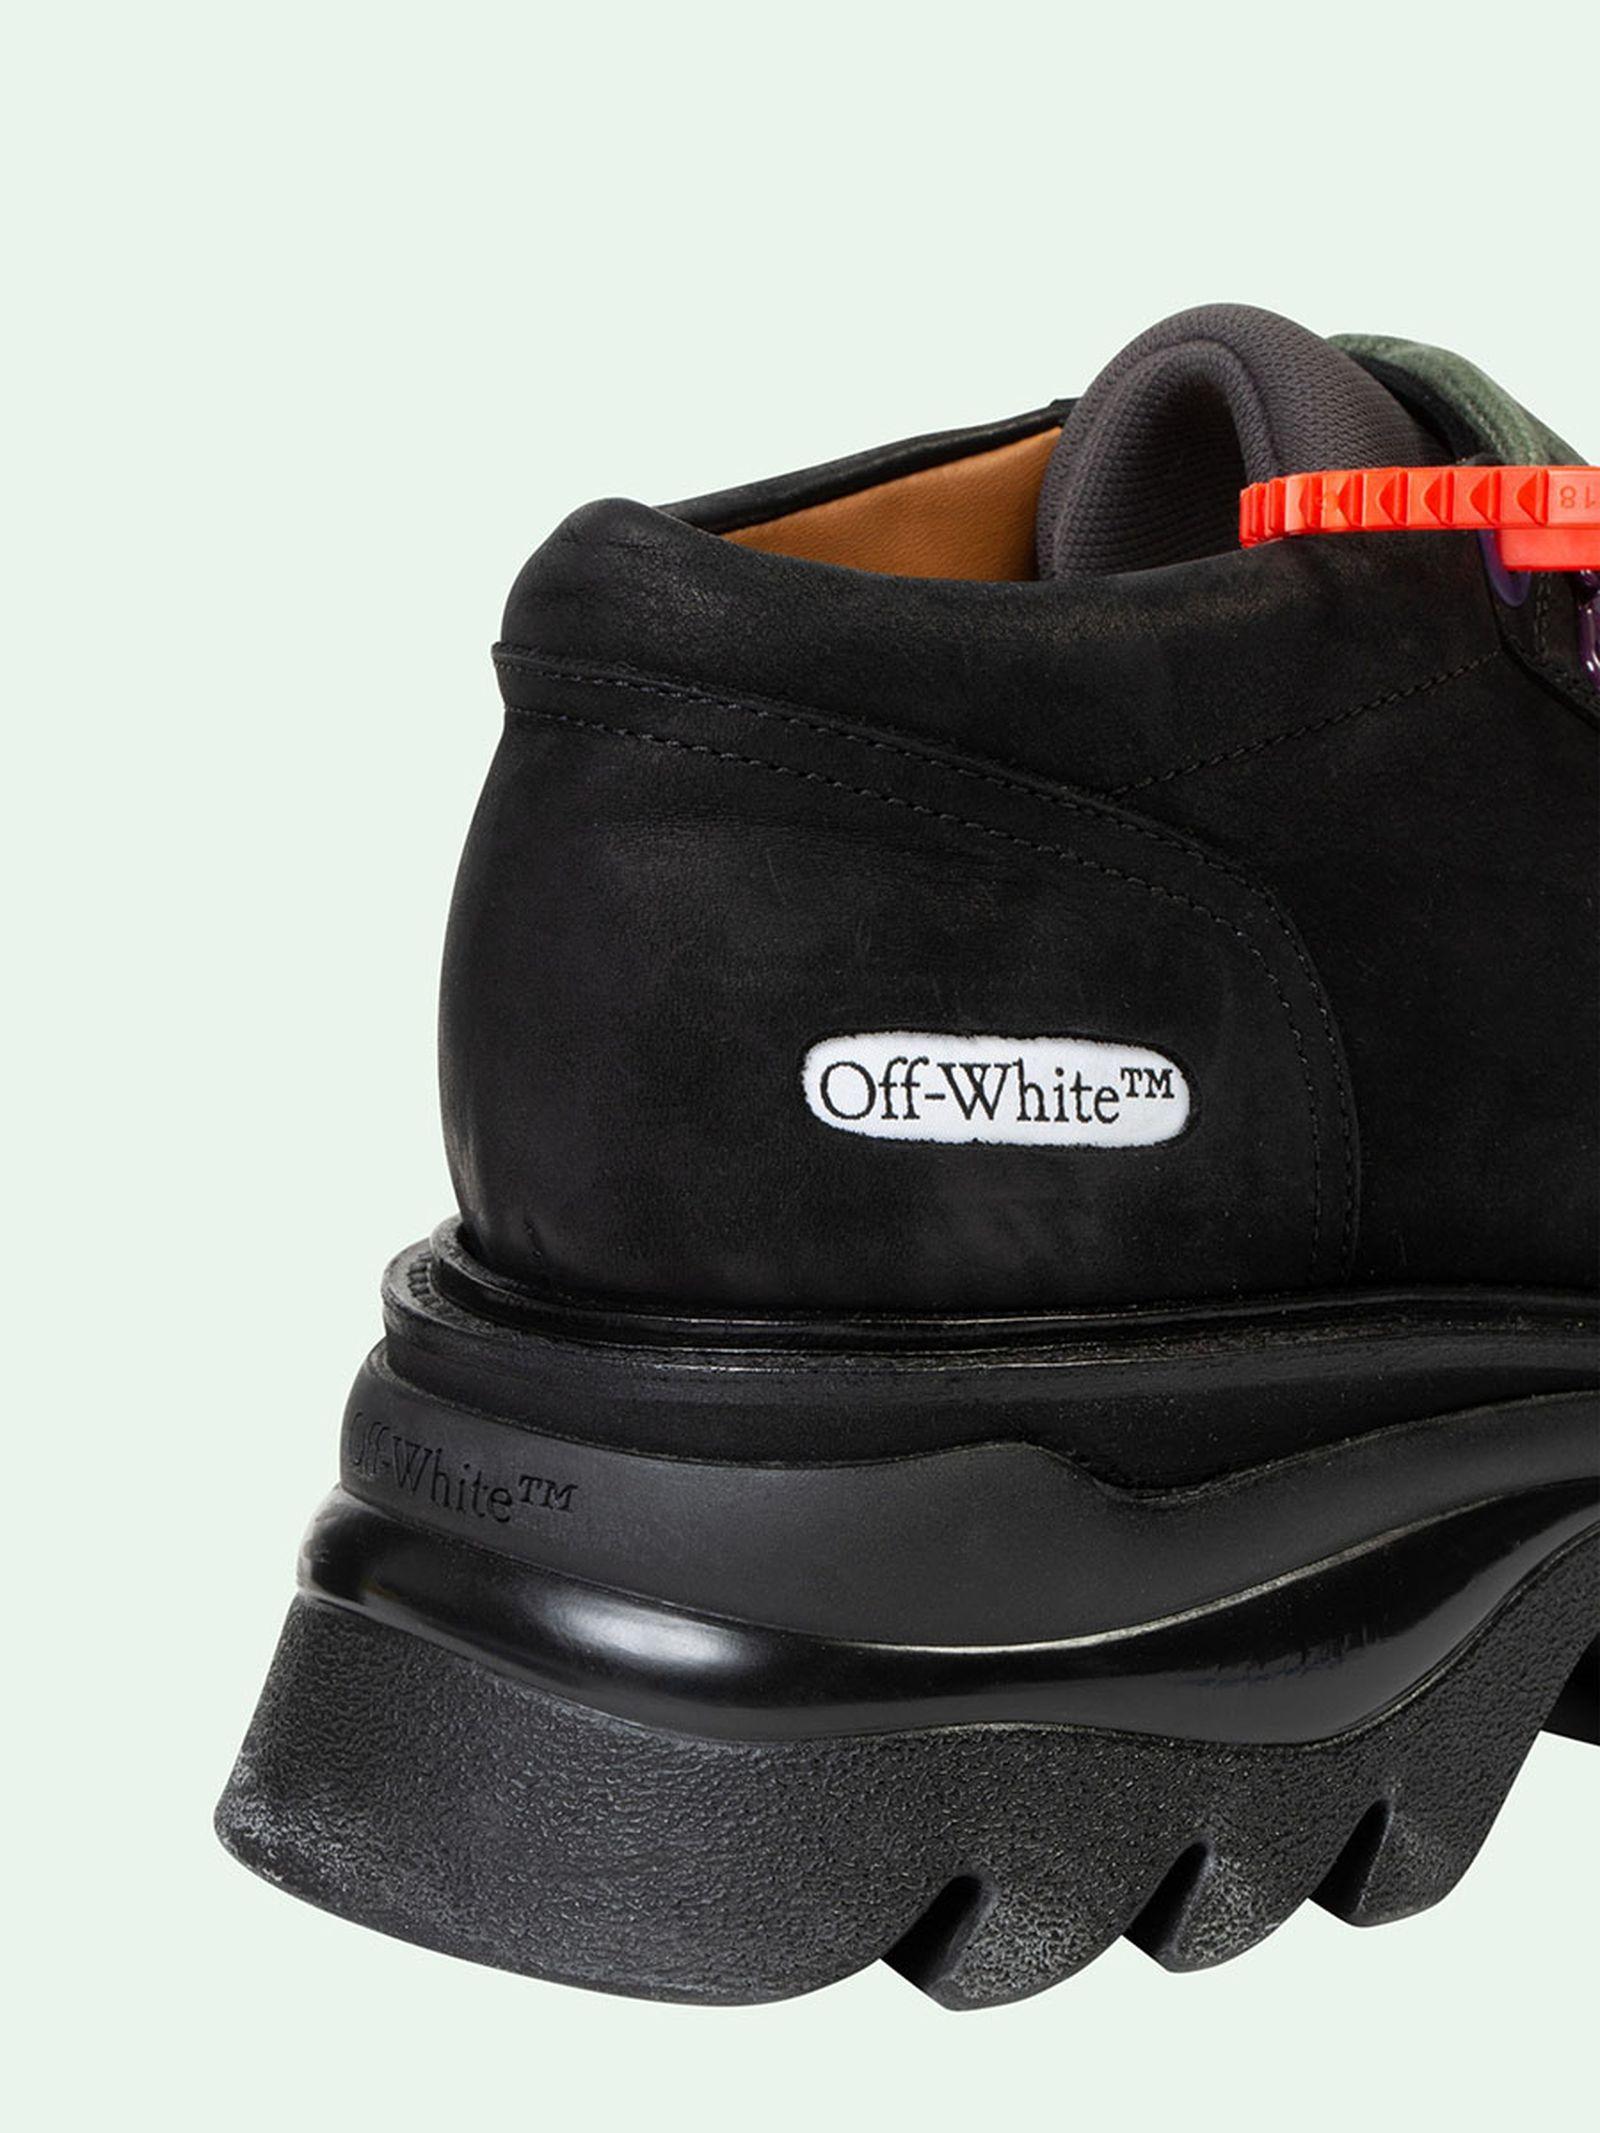 off-white-ridged-sole-sneaker-release-date-price-04